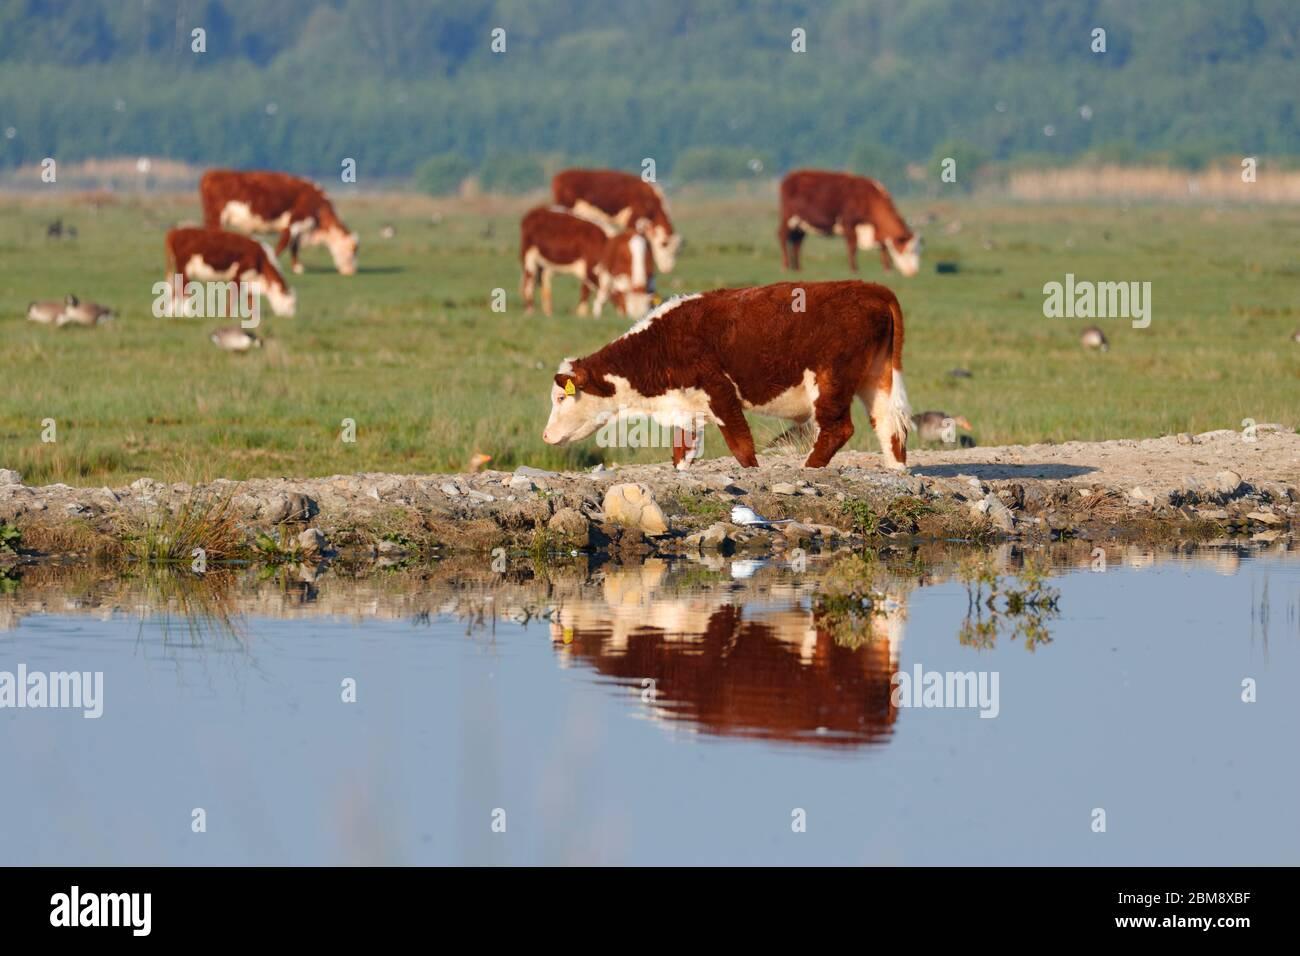 Cattle grazing at RSPB St Aidan's Nature Park in Swillington,Leeds Stock Photo